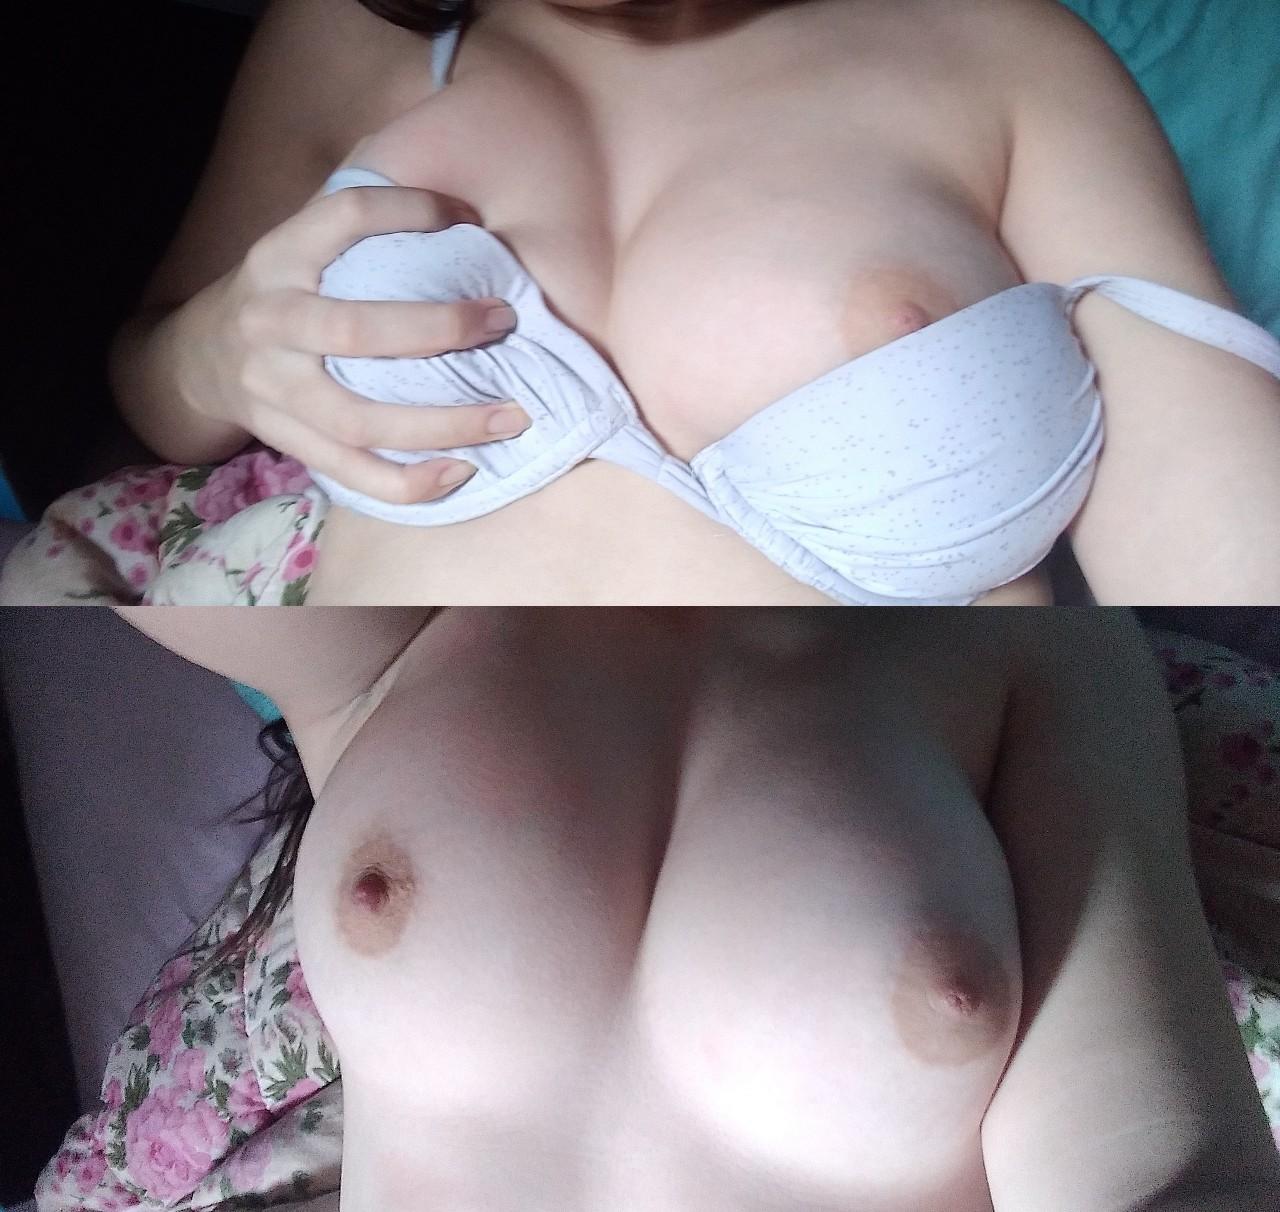 Fotos de Mulheres (20)